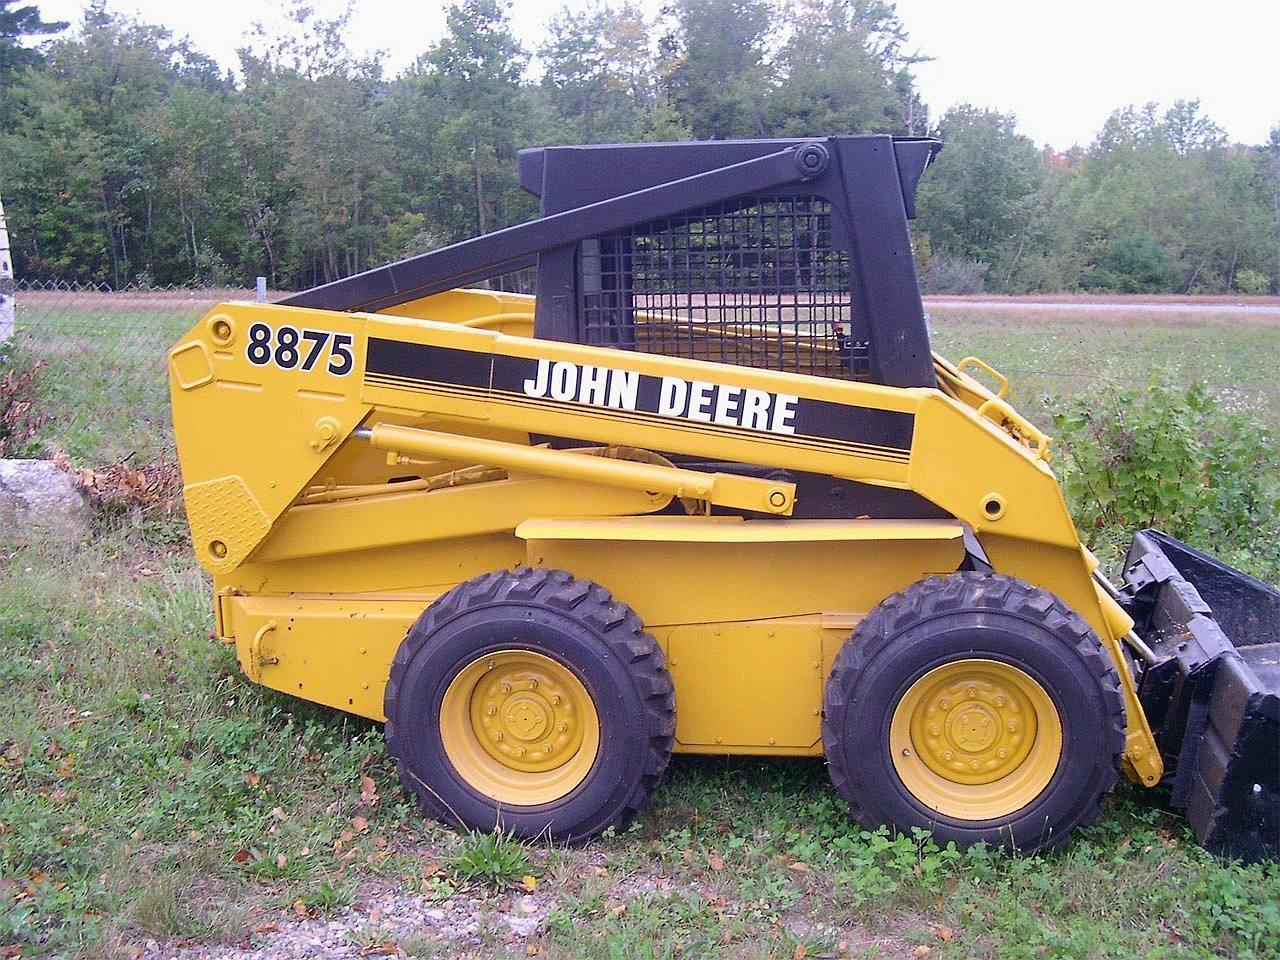 Jd8875 2. Jd8875 2. John Deere 8875 Skid-Steer Loader Technical Service  Manual. Free Shipping